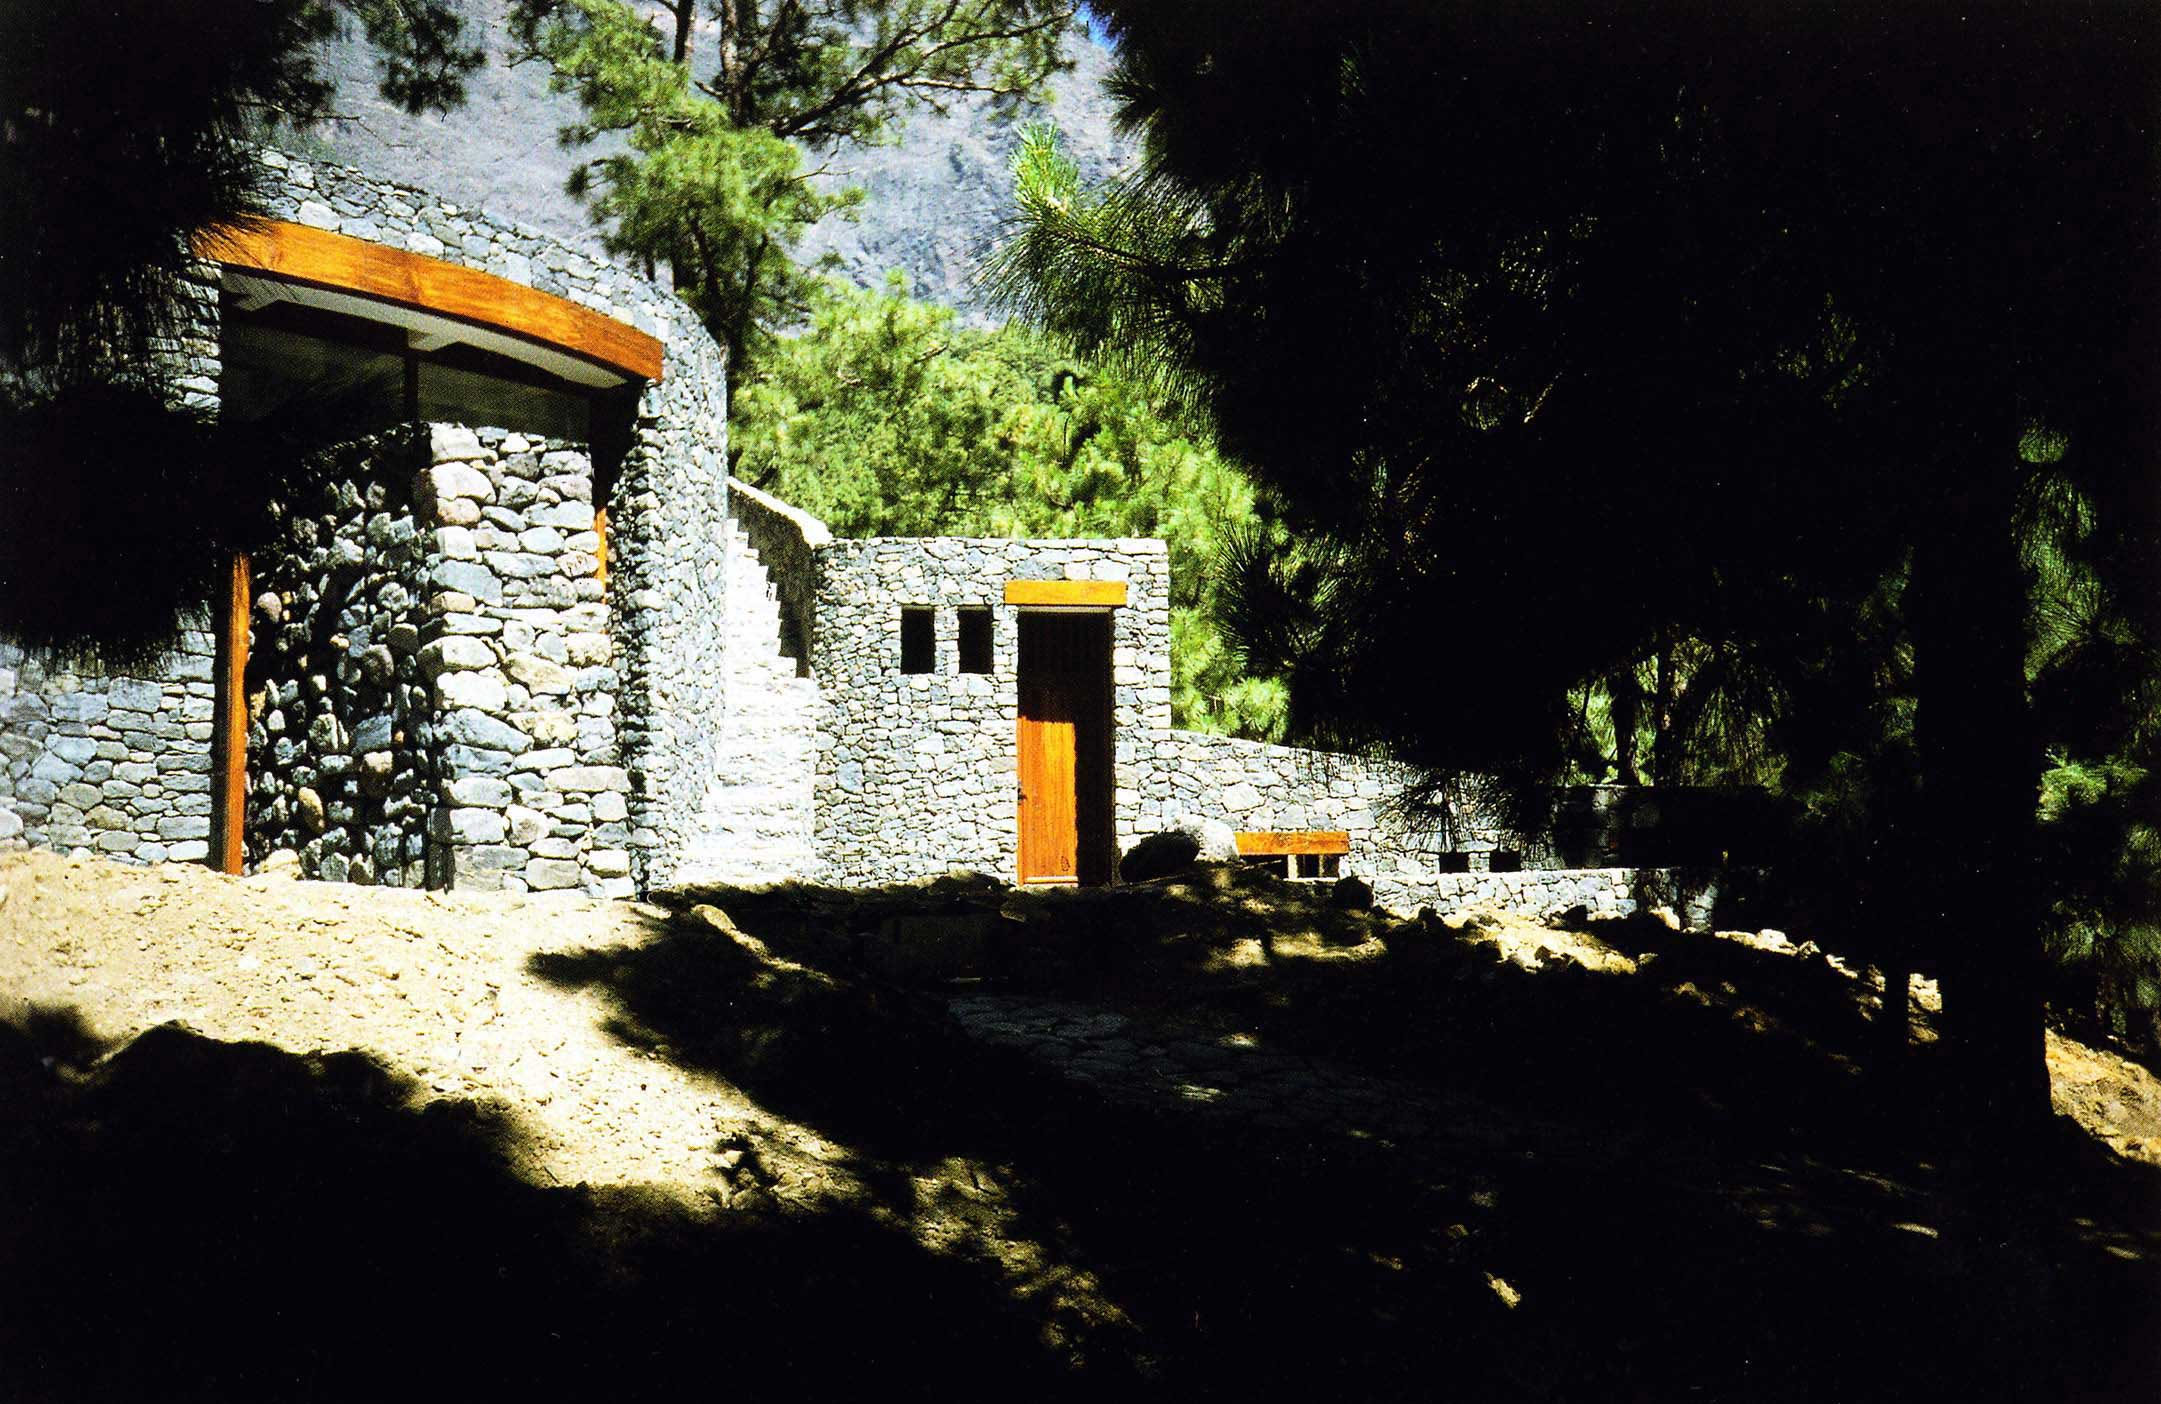 Centro Servicios Caldera Taburiente